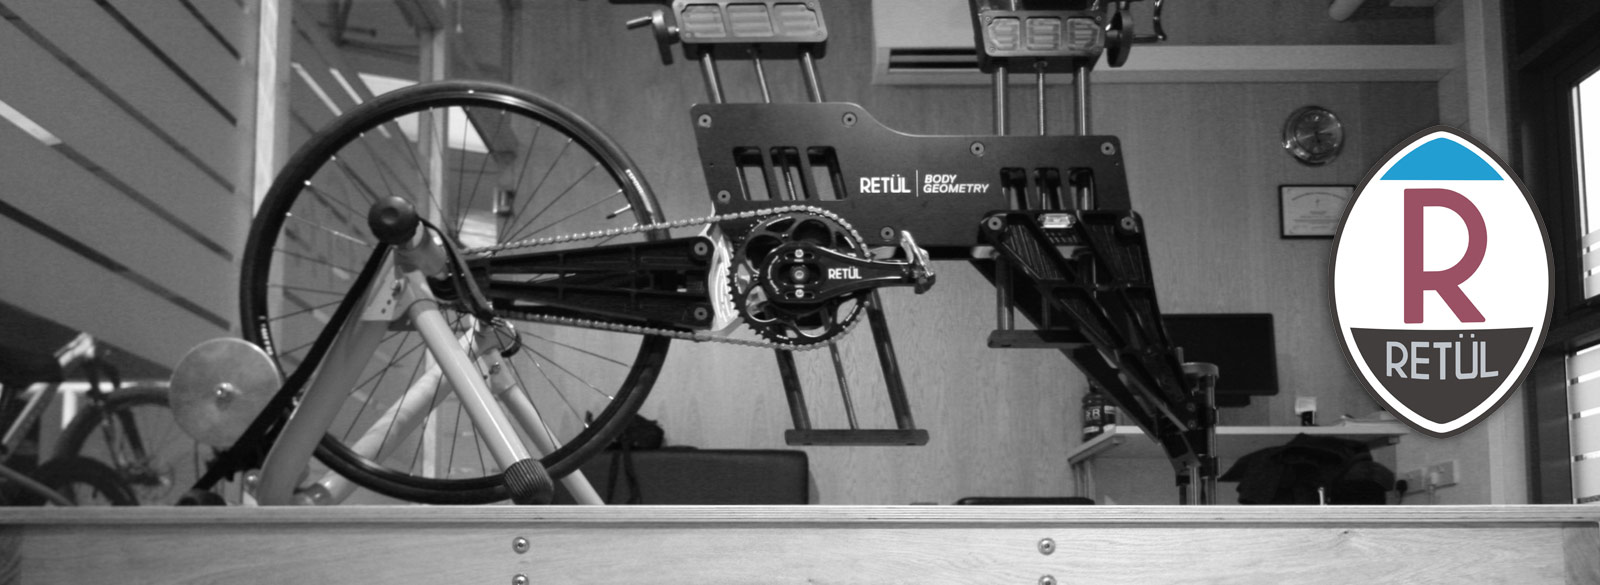 Retul Bike Fitting